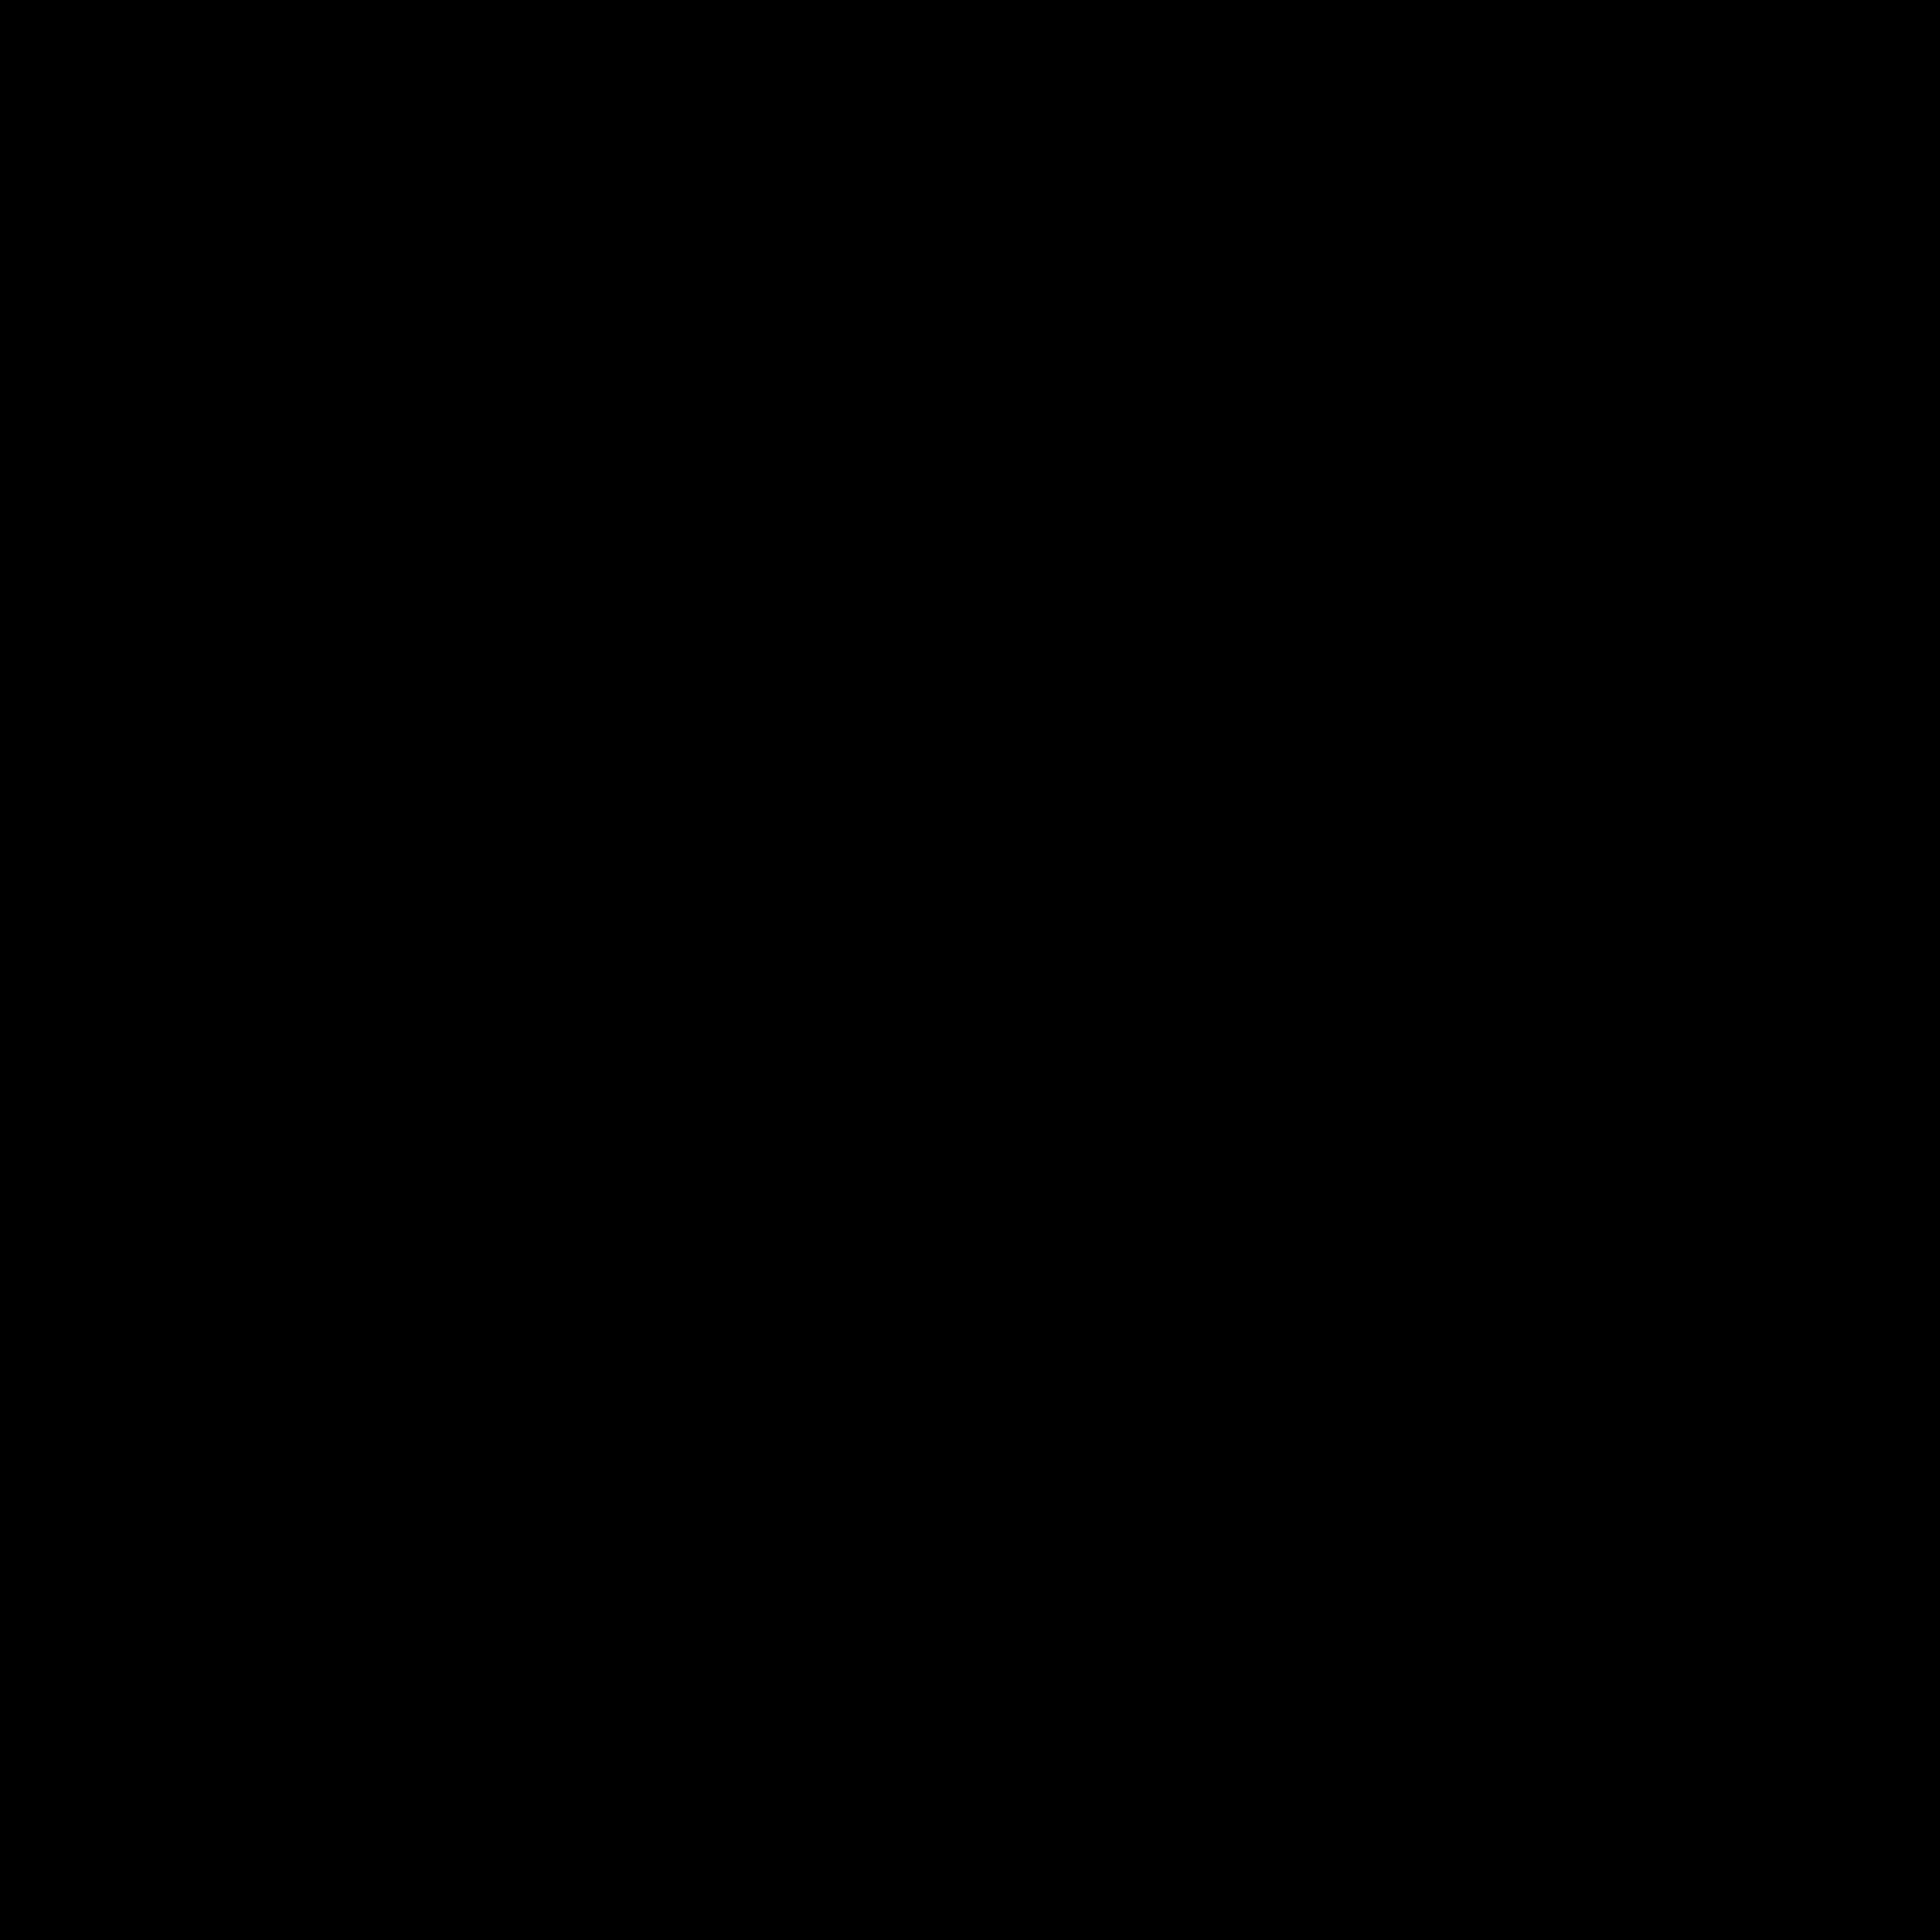 3d Grid Png Image image #43577